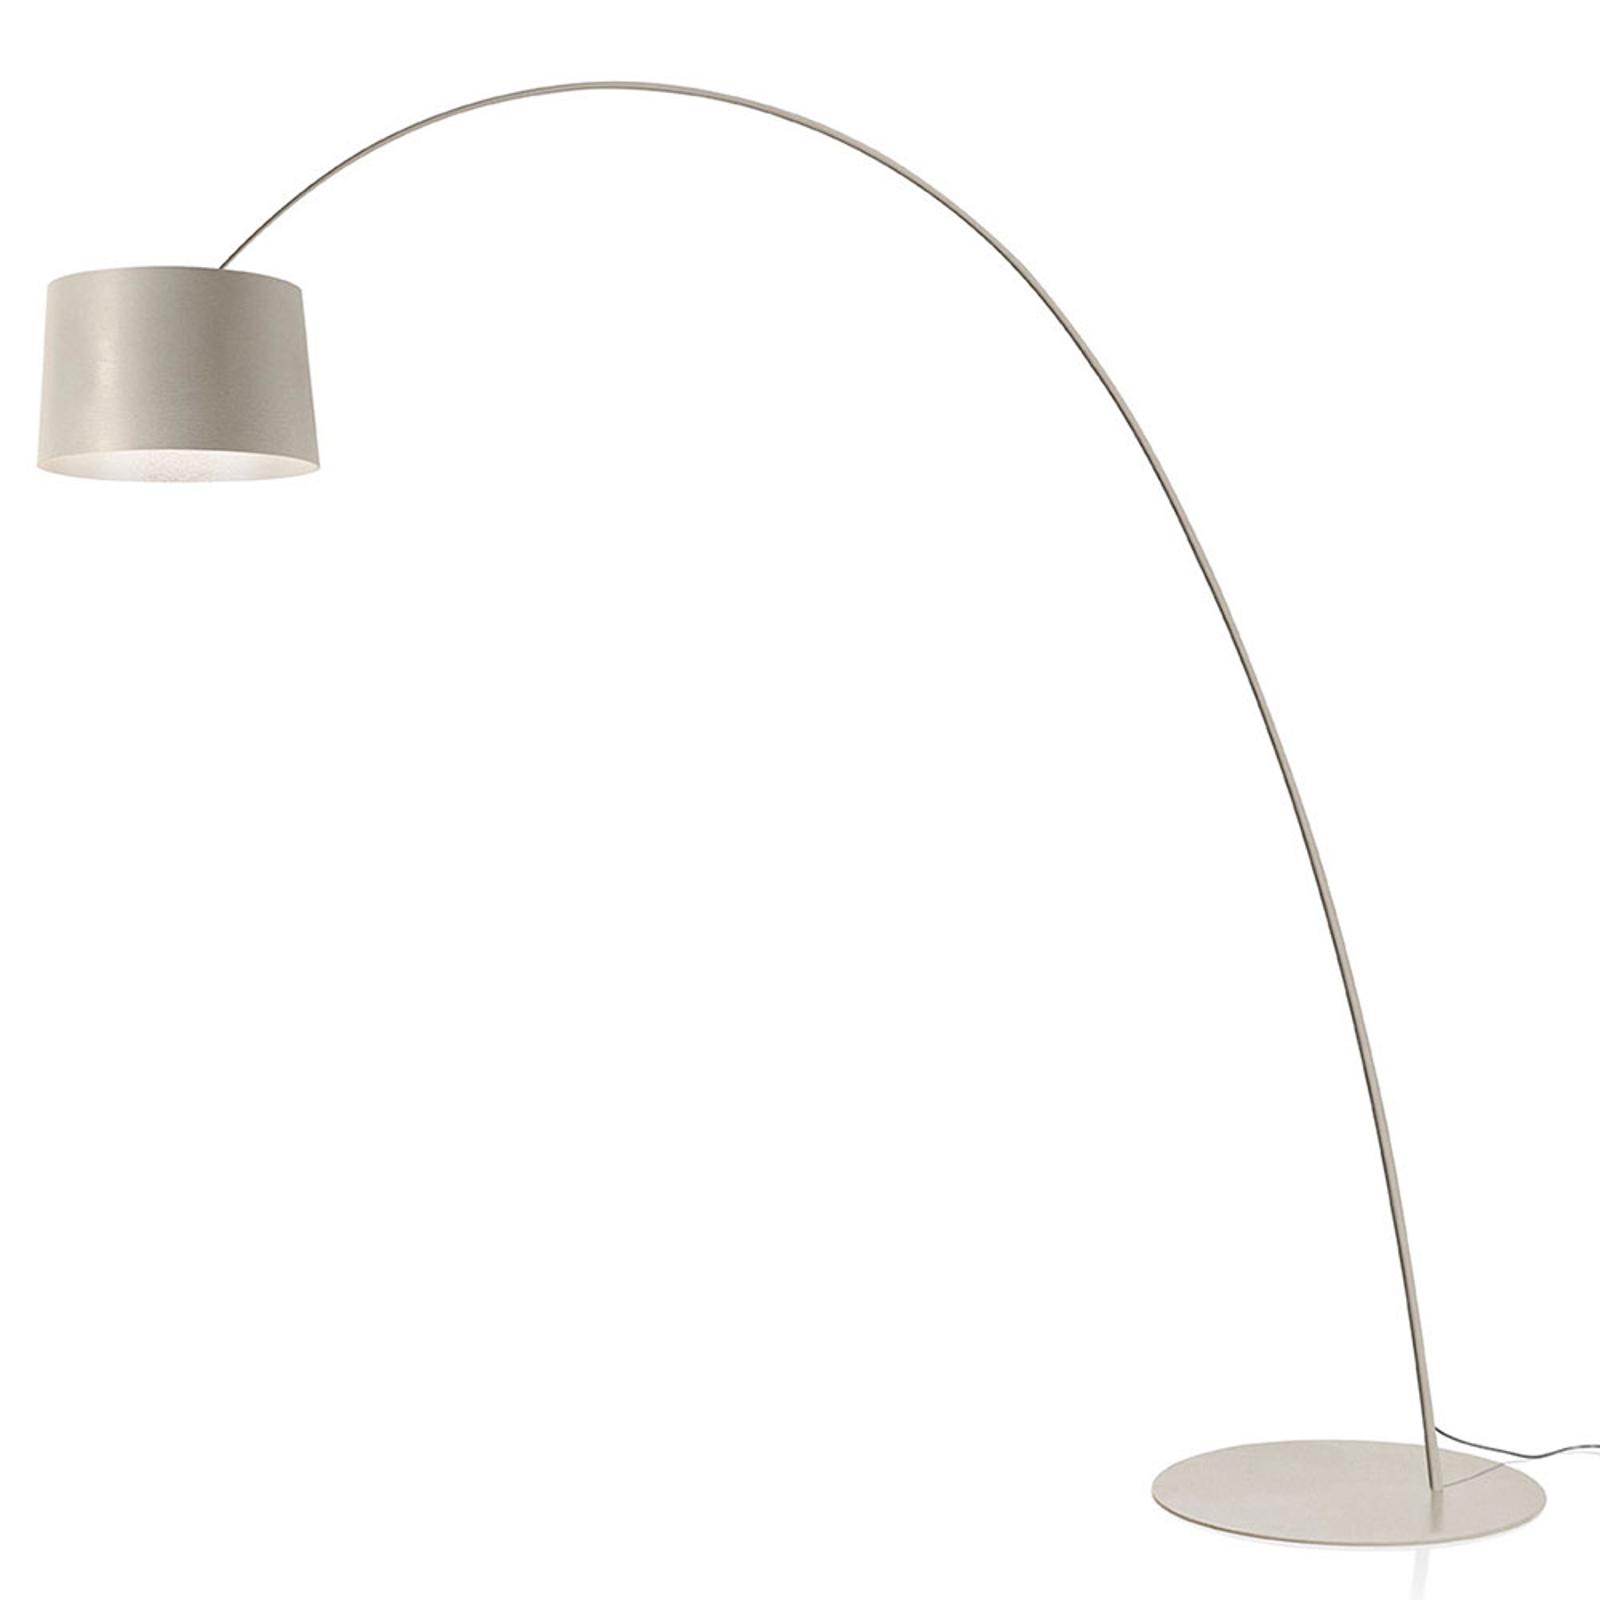 Foscarini Twiggy LED-golvlampa, gråbeige